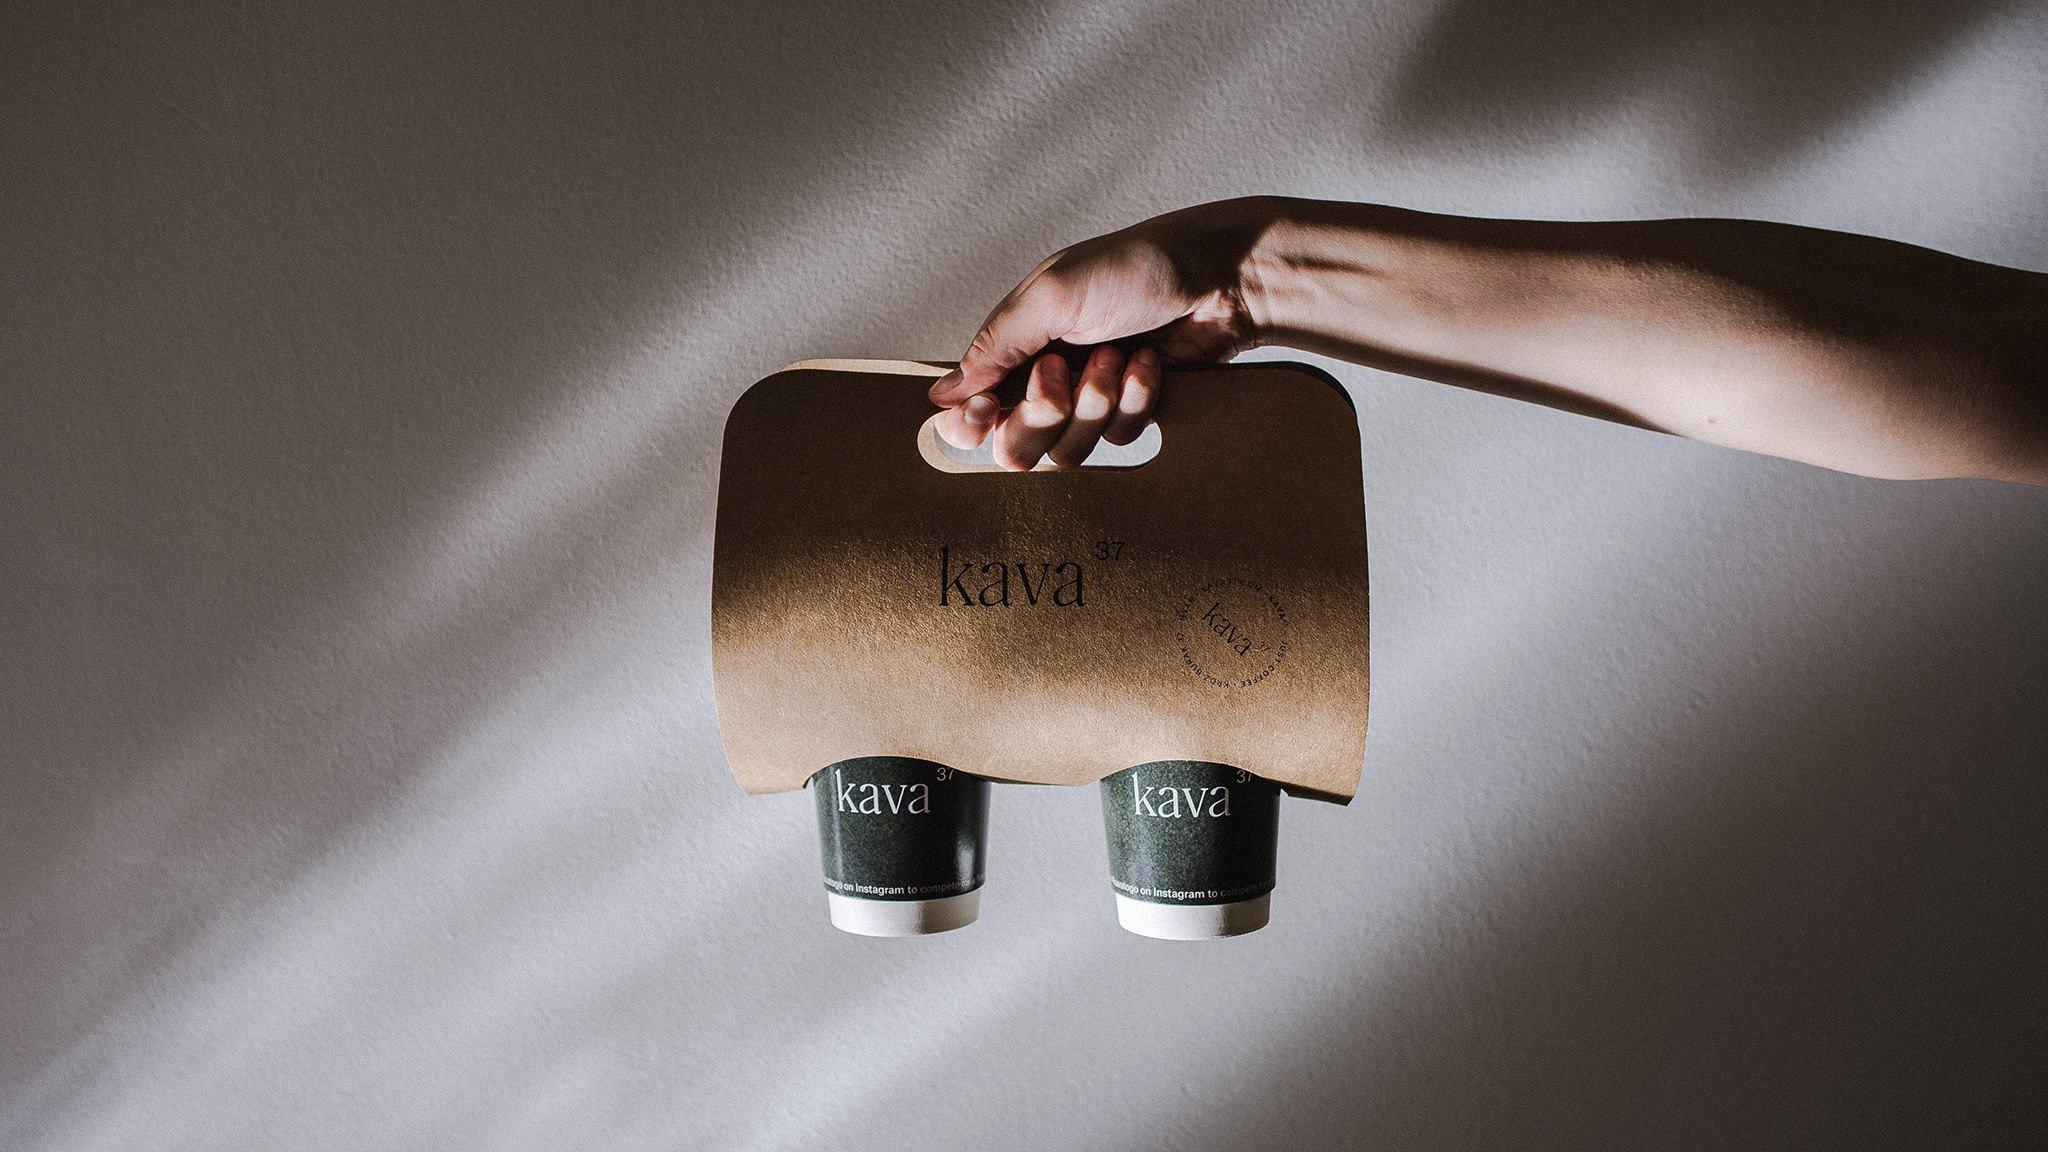 kava family spain Barcelona